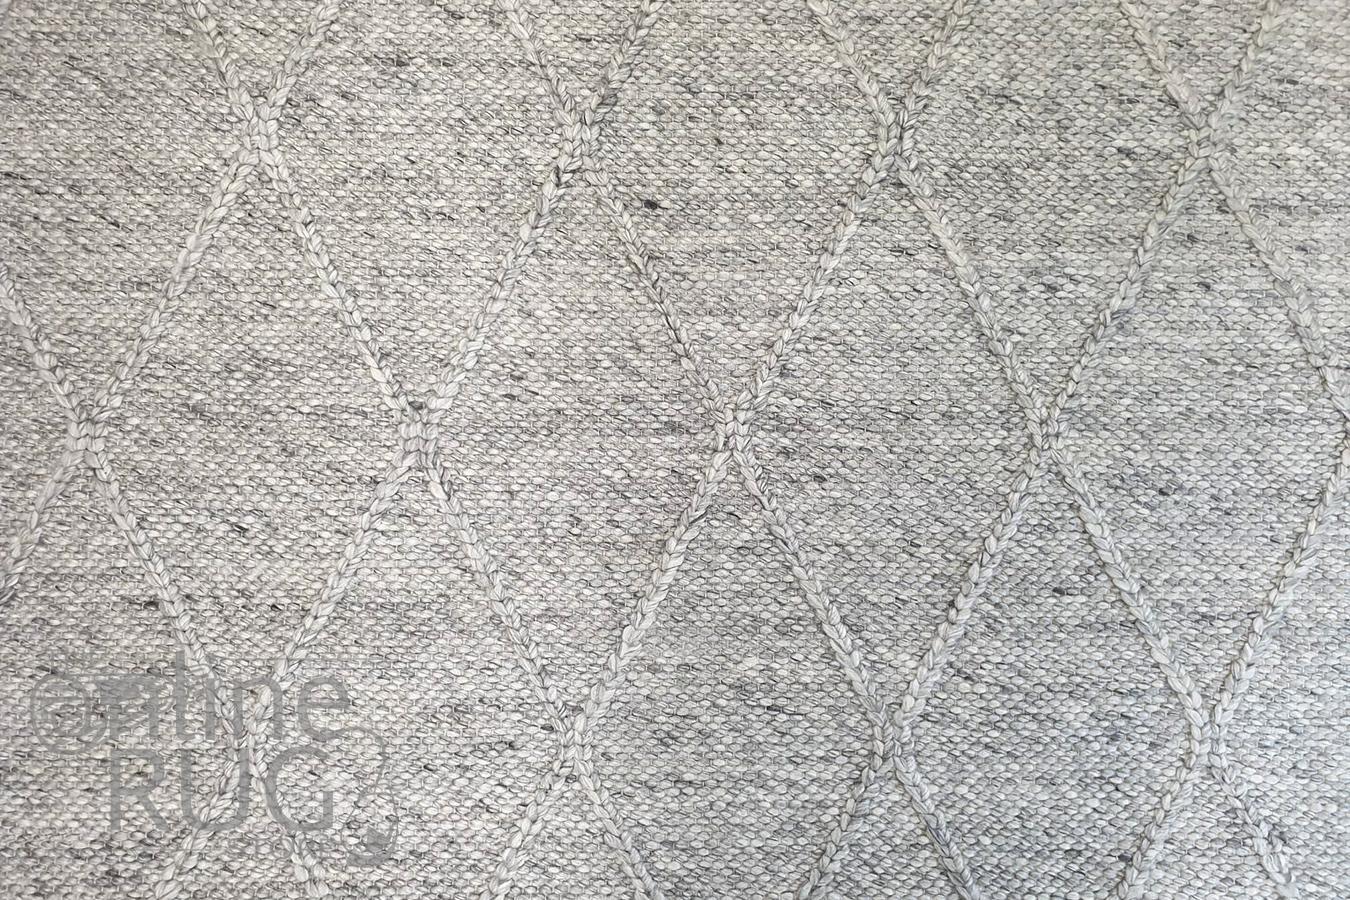 Darcy Diamond Beige Silver Felted Wool Rug